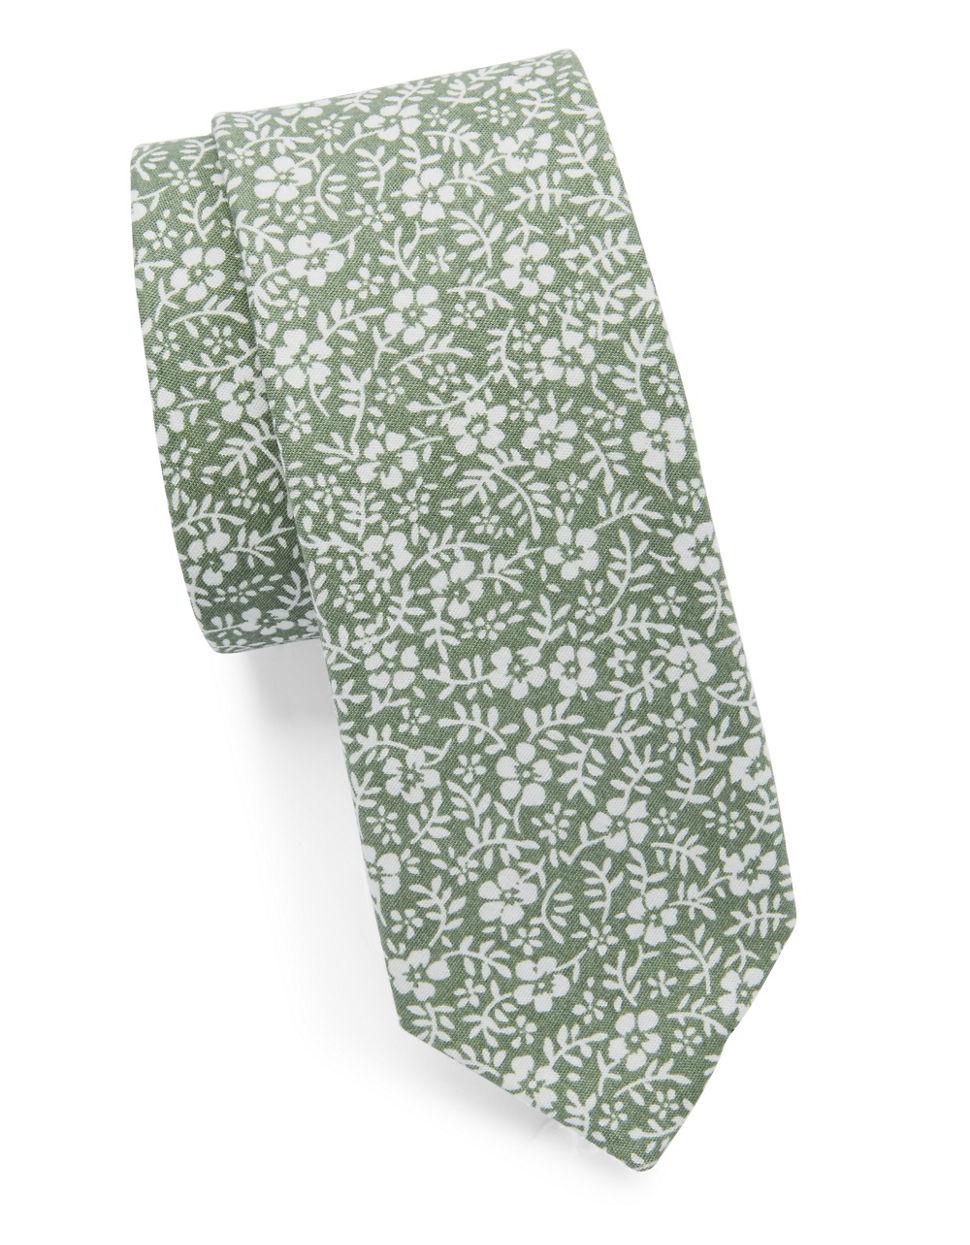 Lyst - Original Penguin Floral Tie in Green for Men